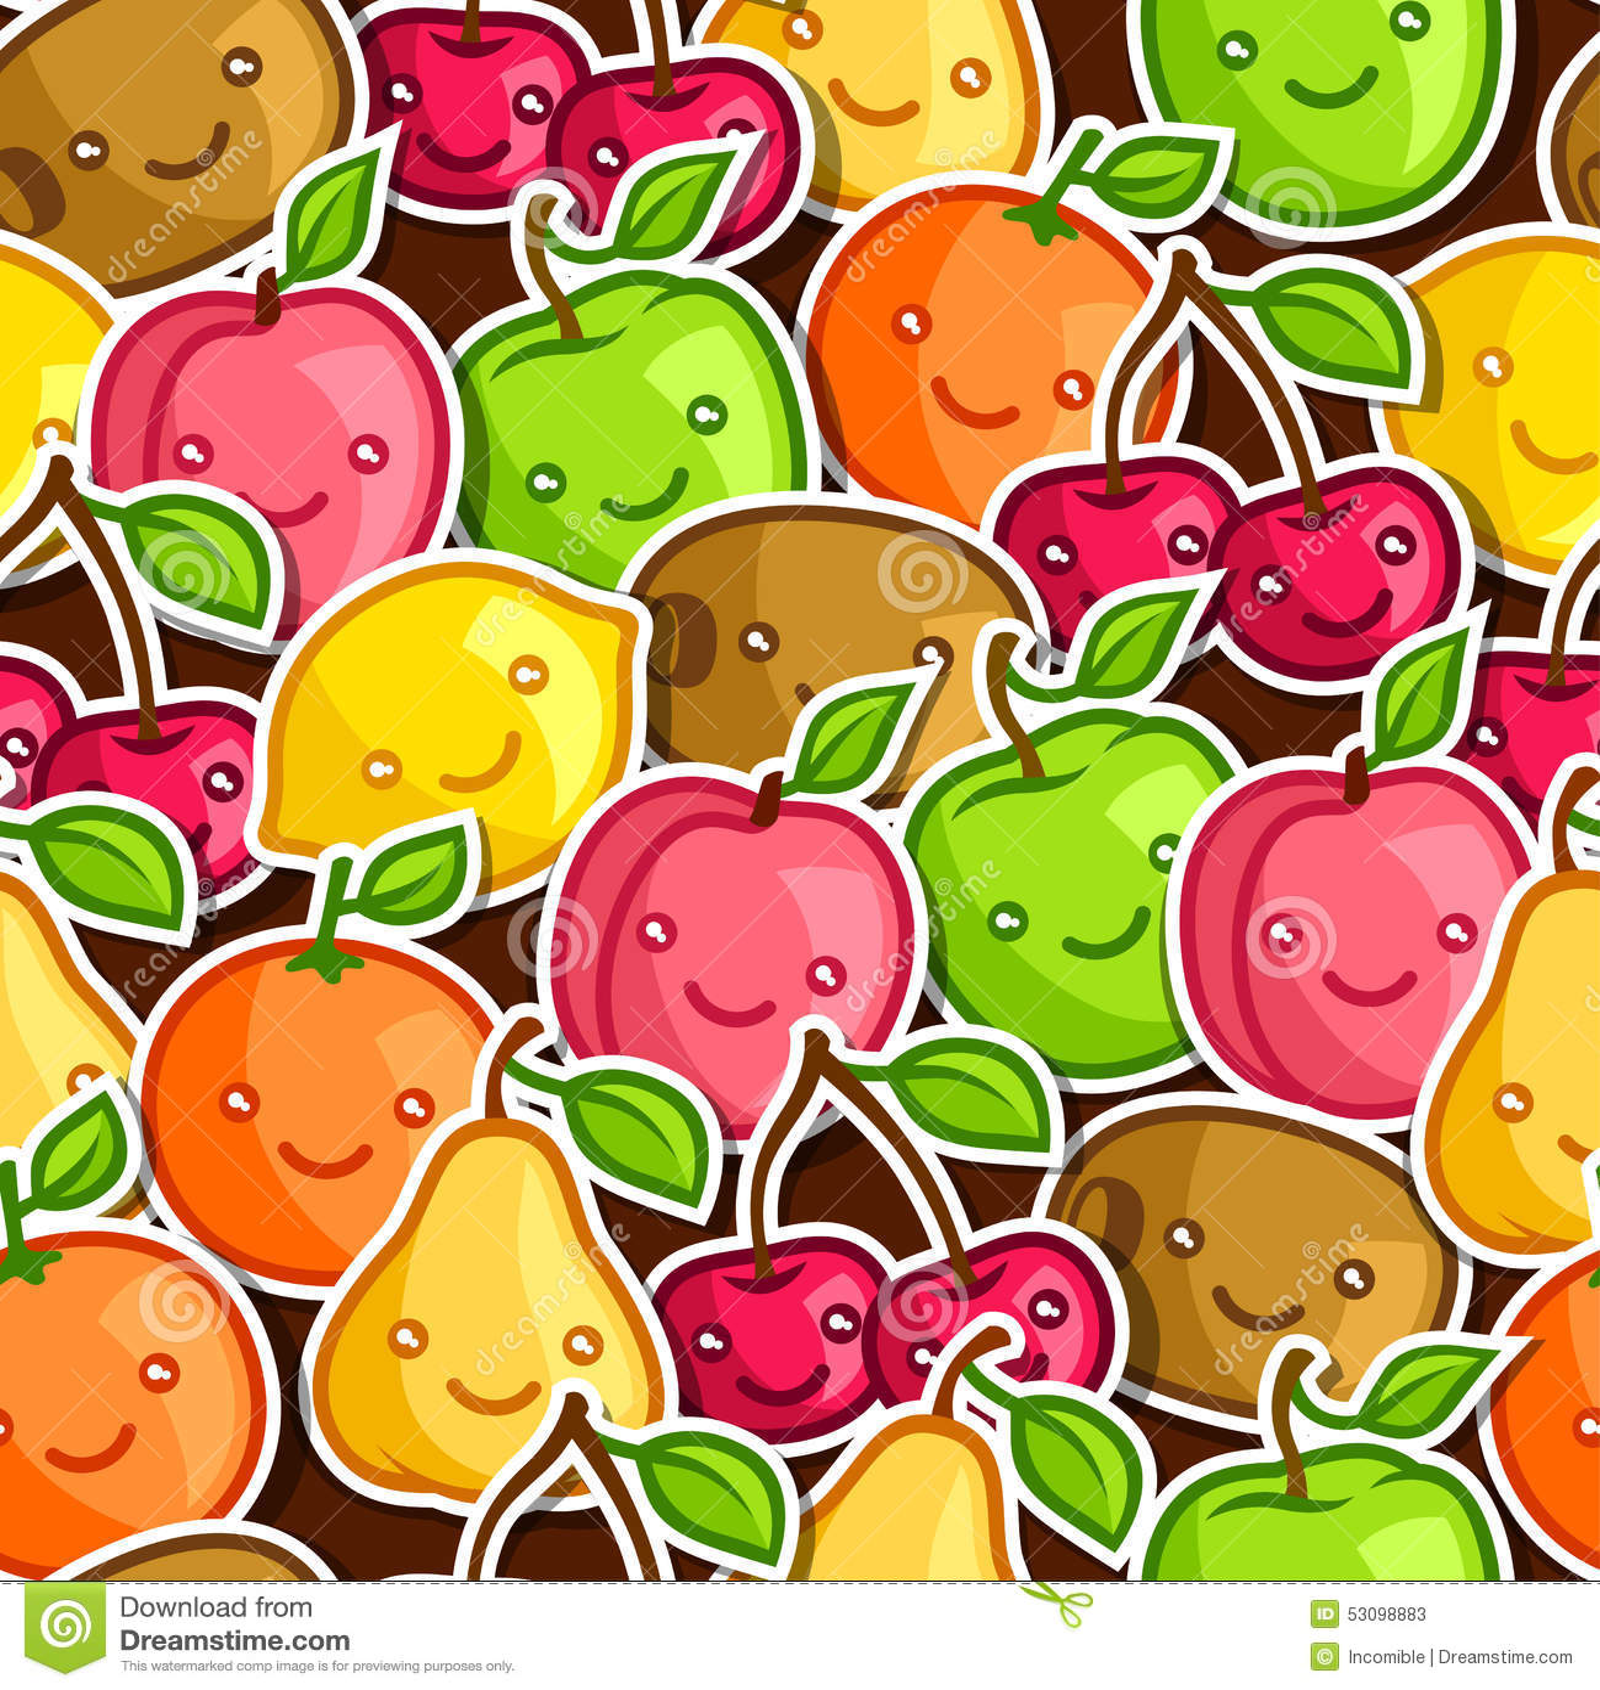 Seamless pattern with cute kawaii smiling fruits Stock Photos